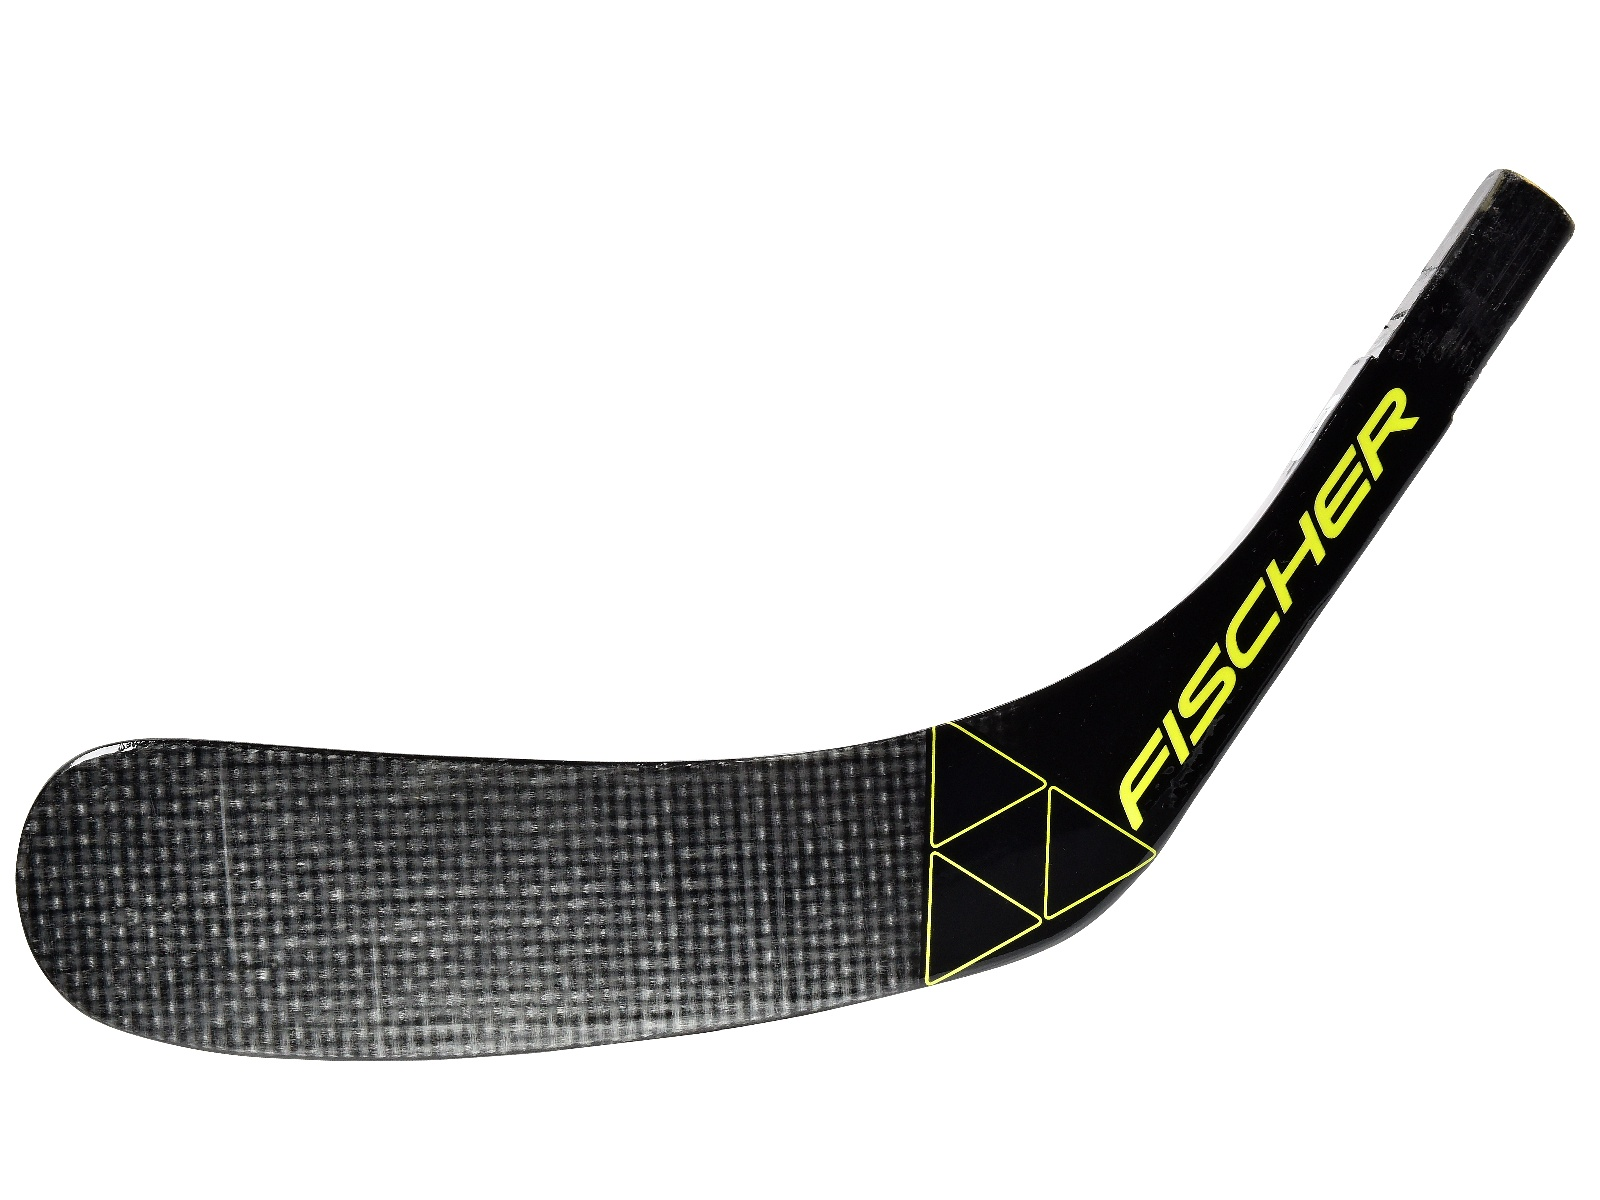 Hokejová čepel FISCHER W300 Senior - RH 23